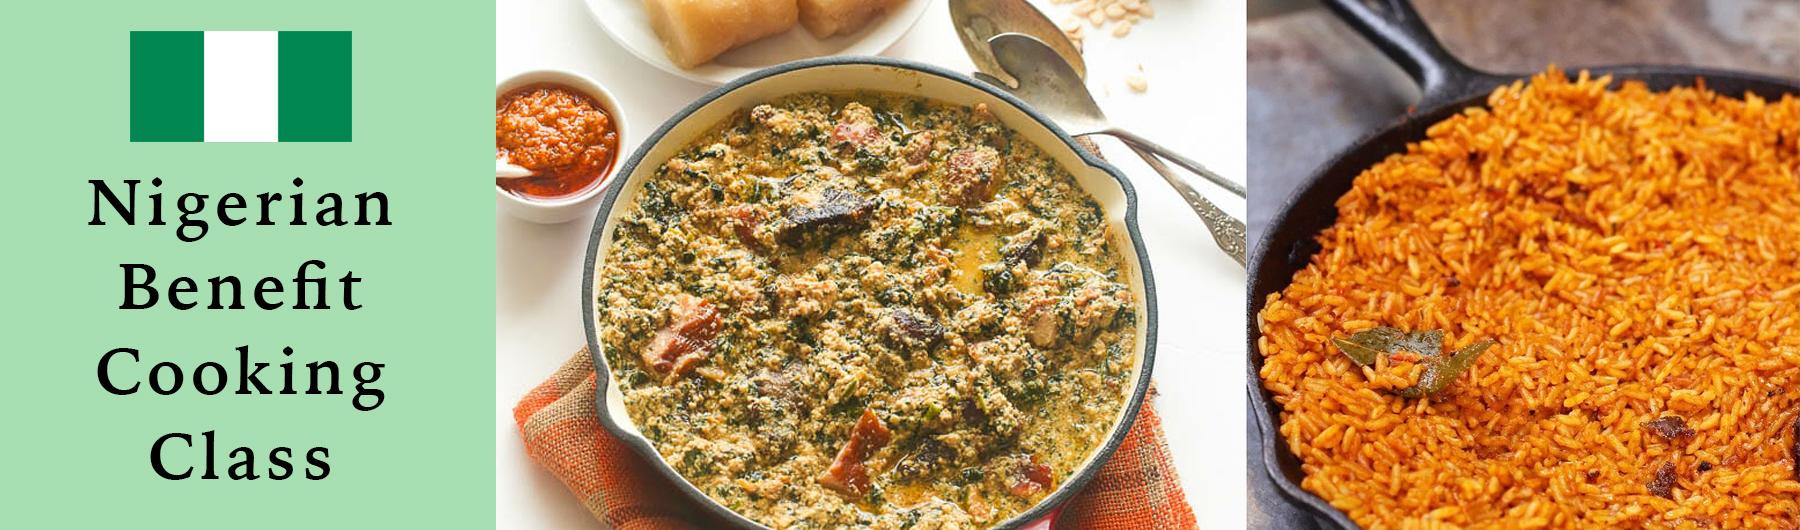 Nigerian Benefit Cooking Class